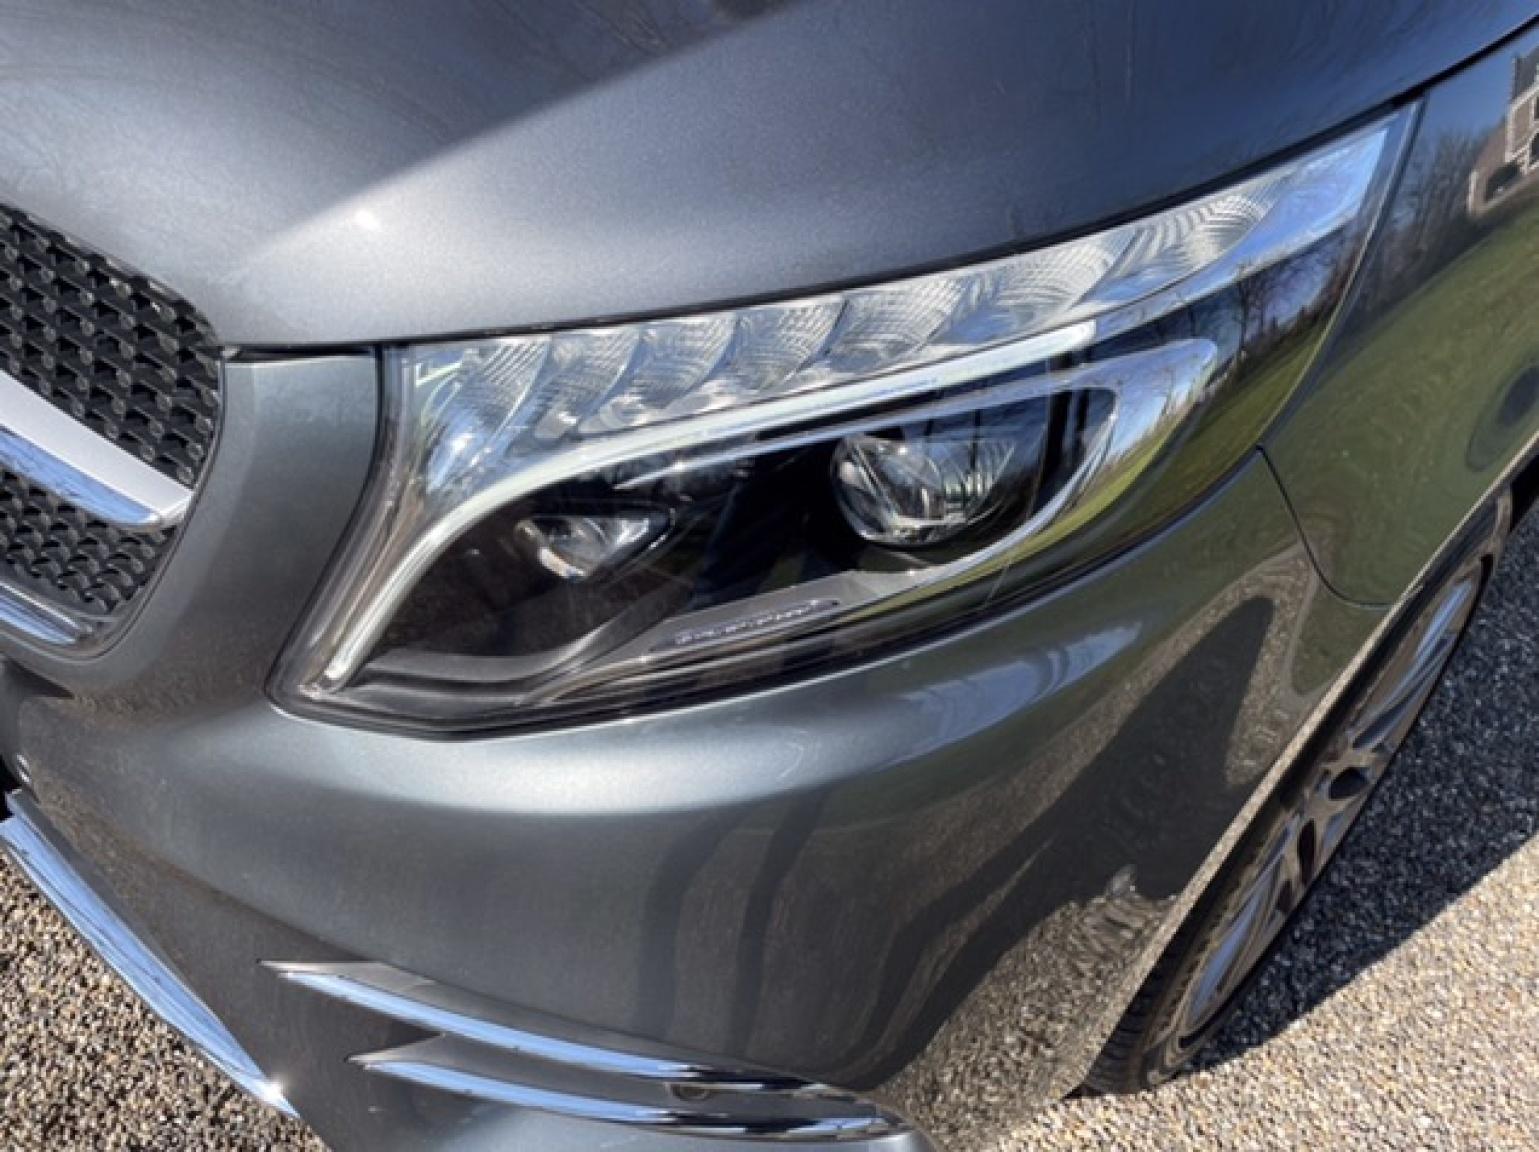 Mercedes-Benz-V-Klasse-8